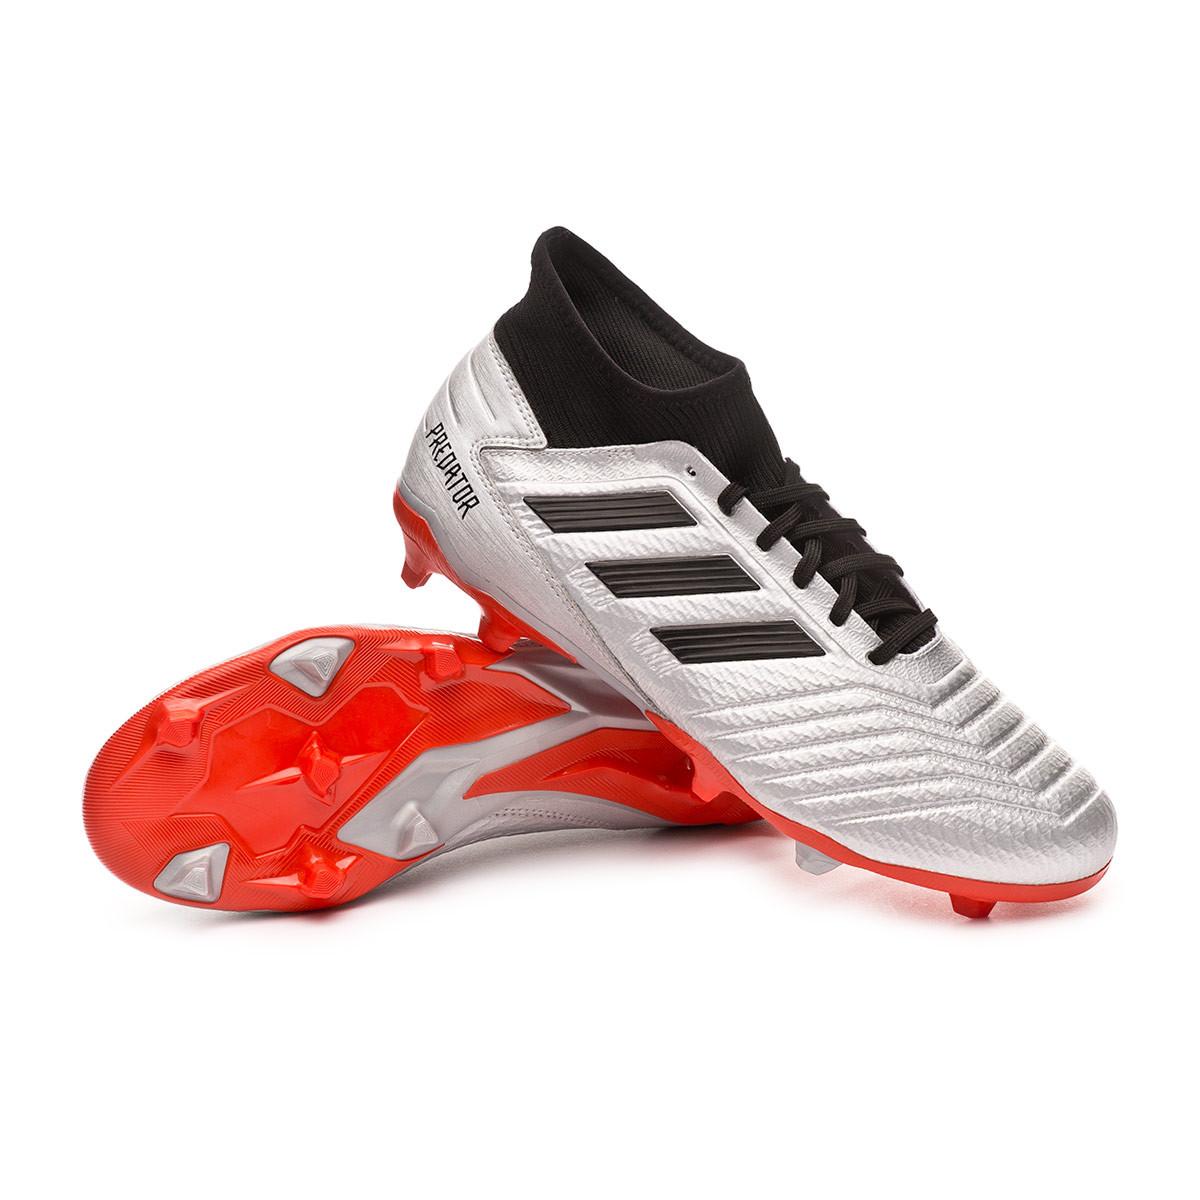 chaussure de foot adidas predator